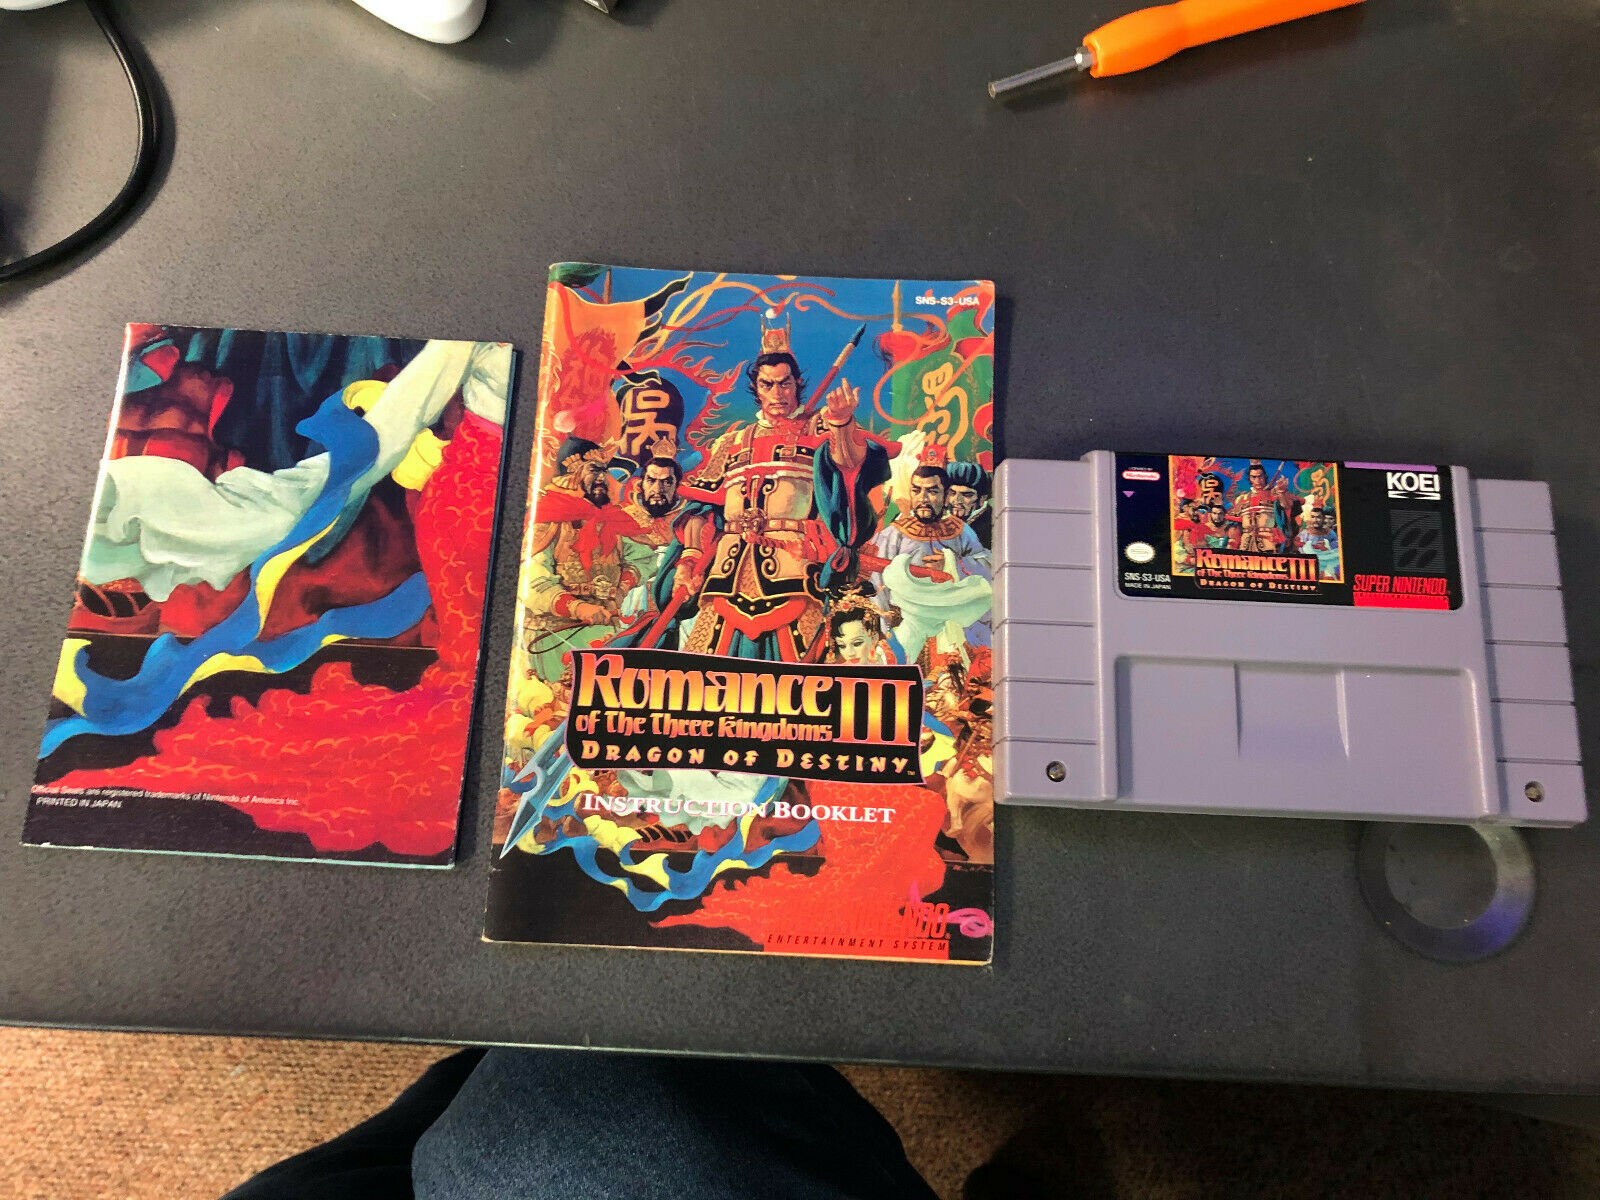 Romance Of The Three Kingdoms III Dragon Of Destiny Super Nintendo SNES, 1994  - $53.00